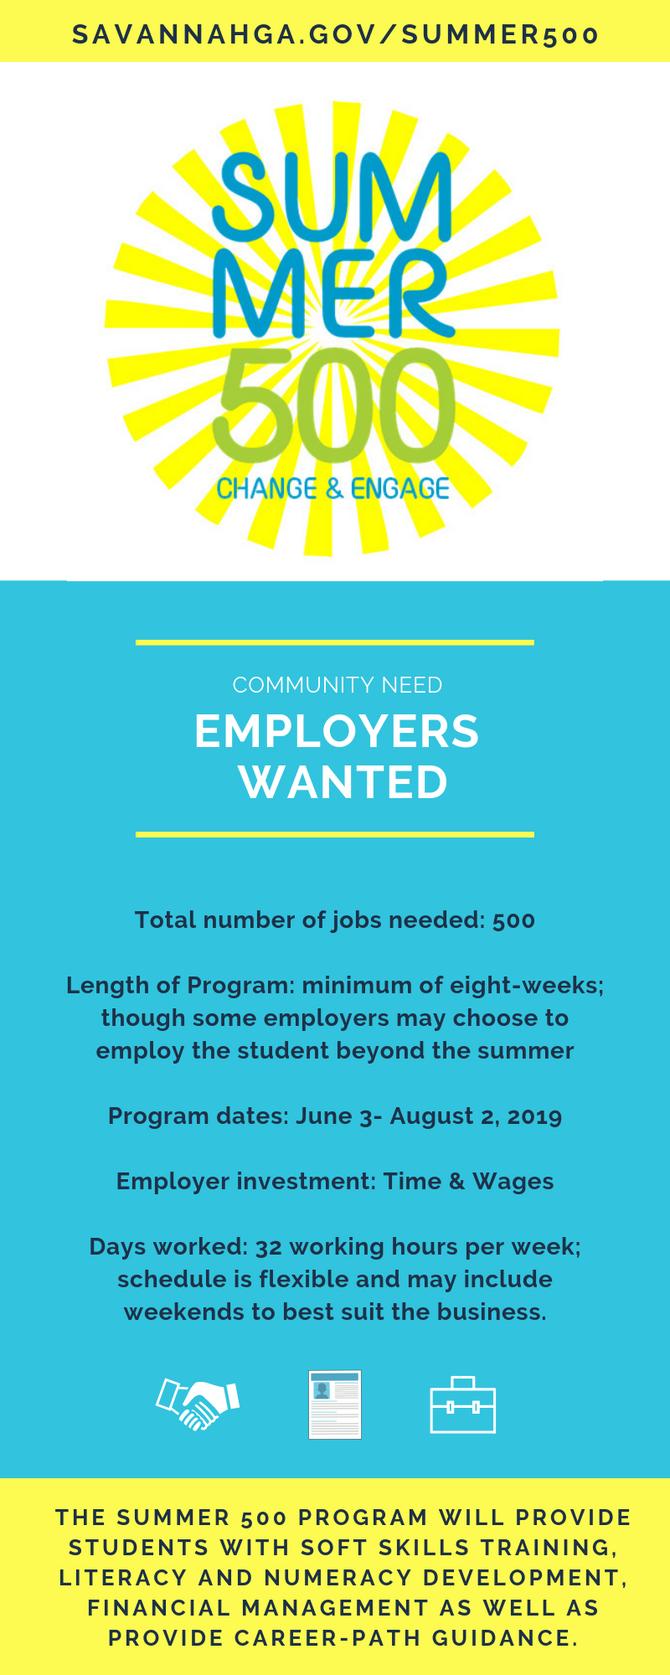 Summer 500 Program seeks employers